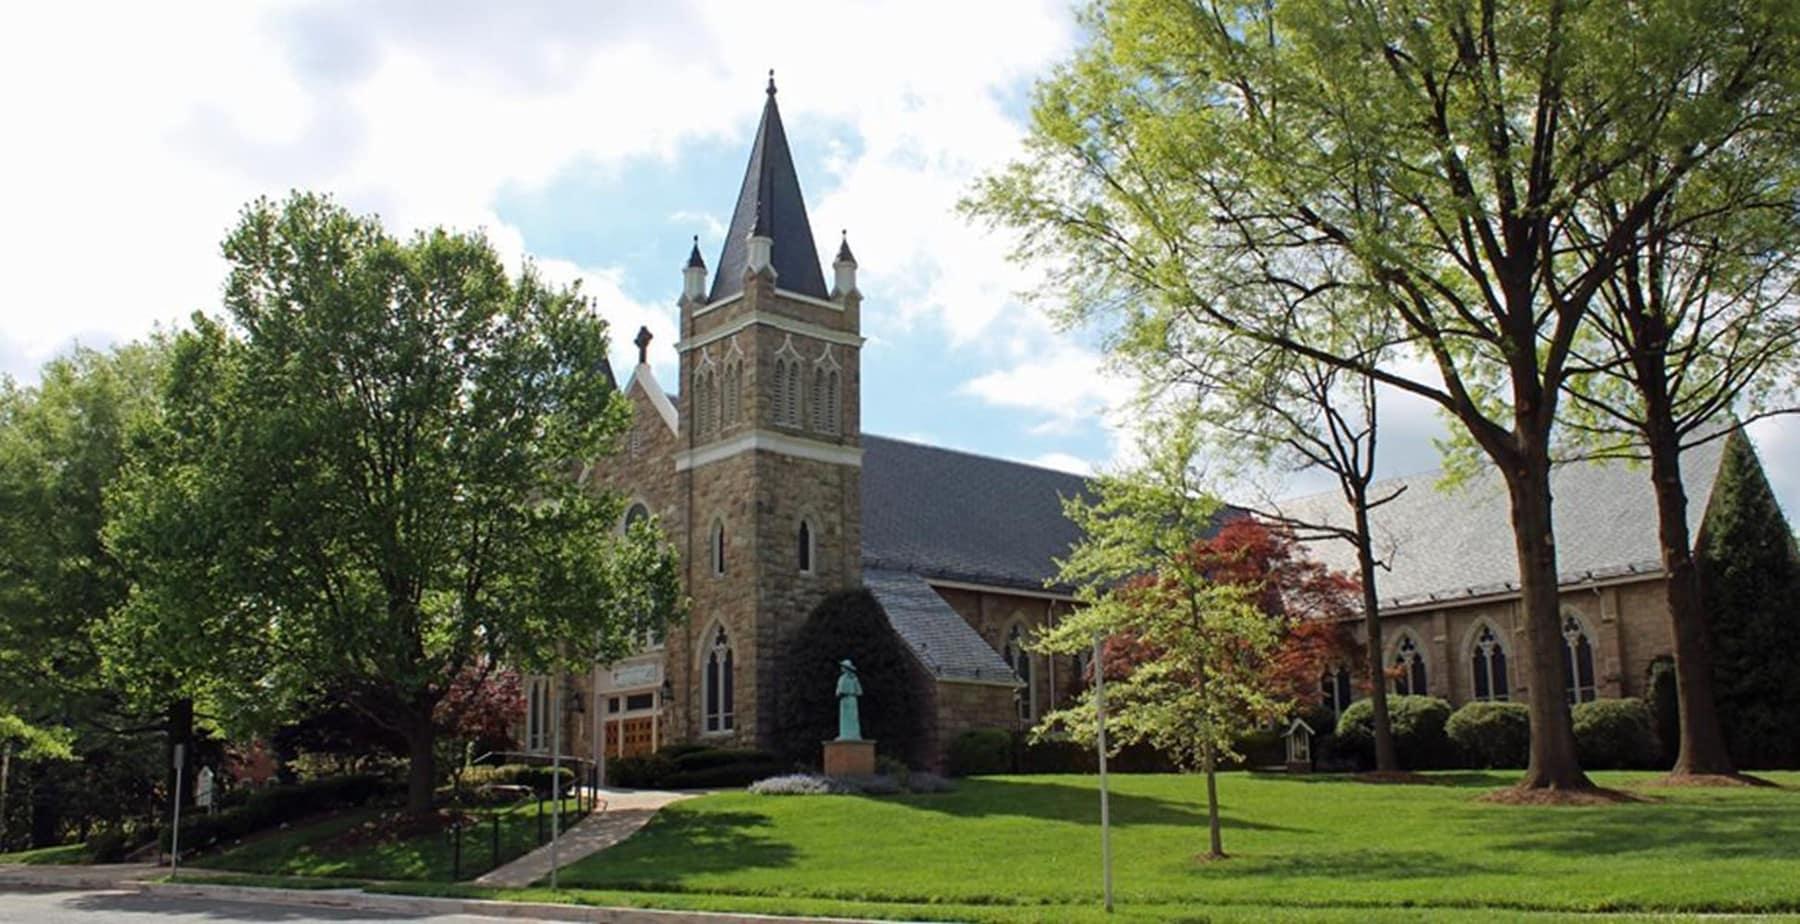 St. James Roman Catholic Church